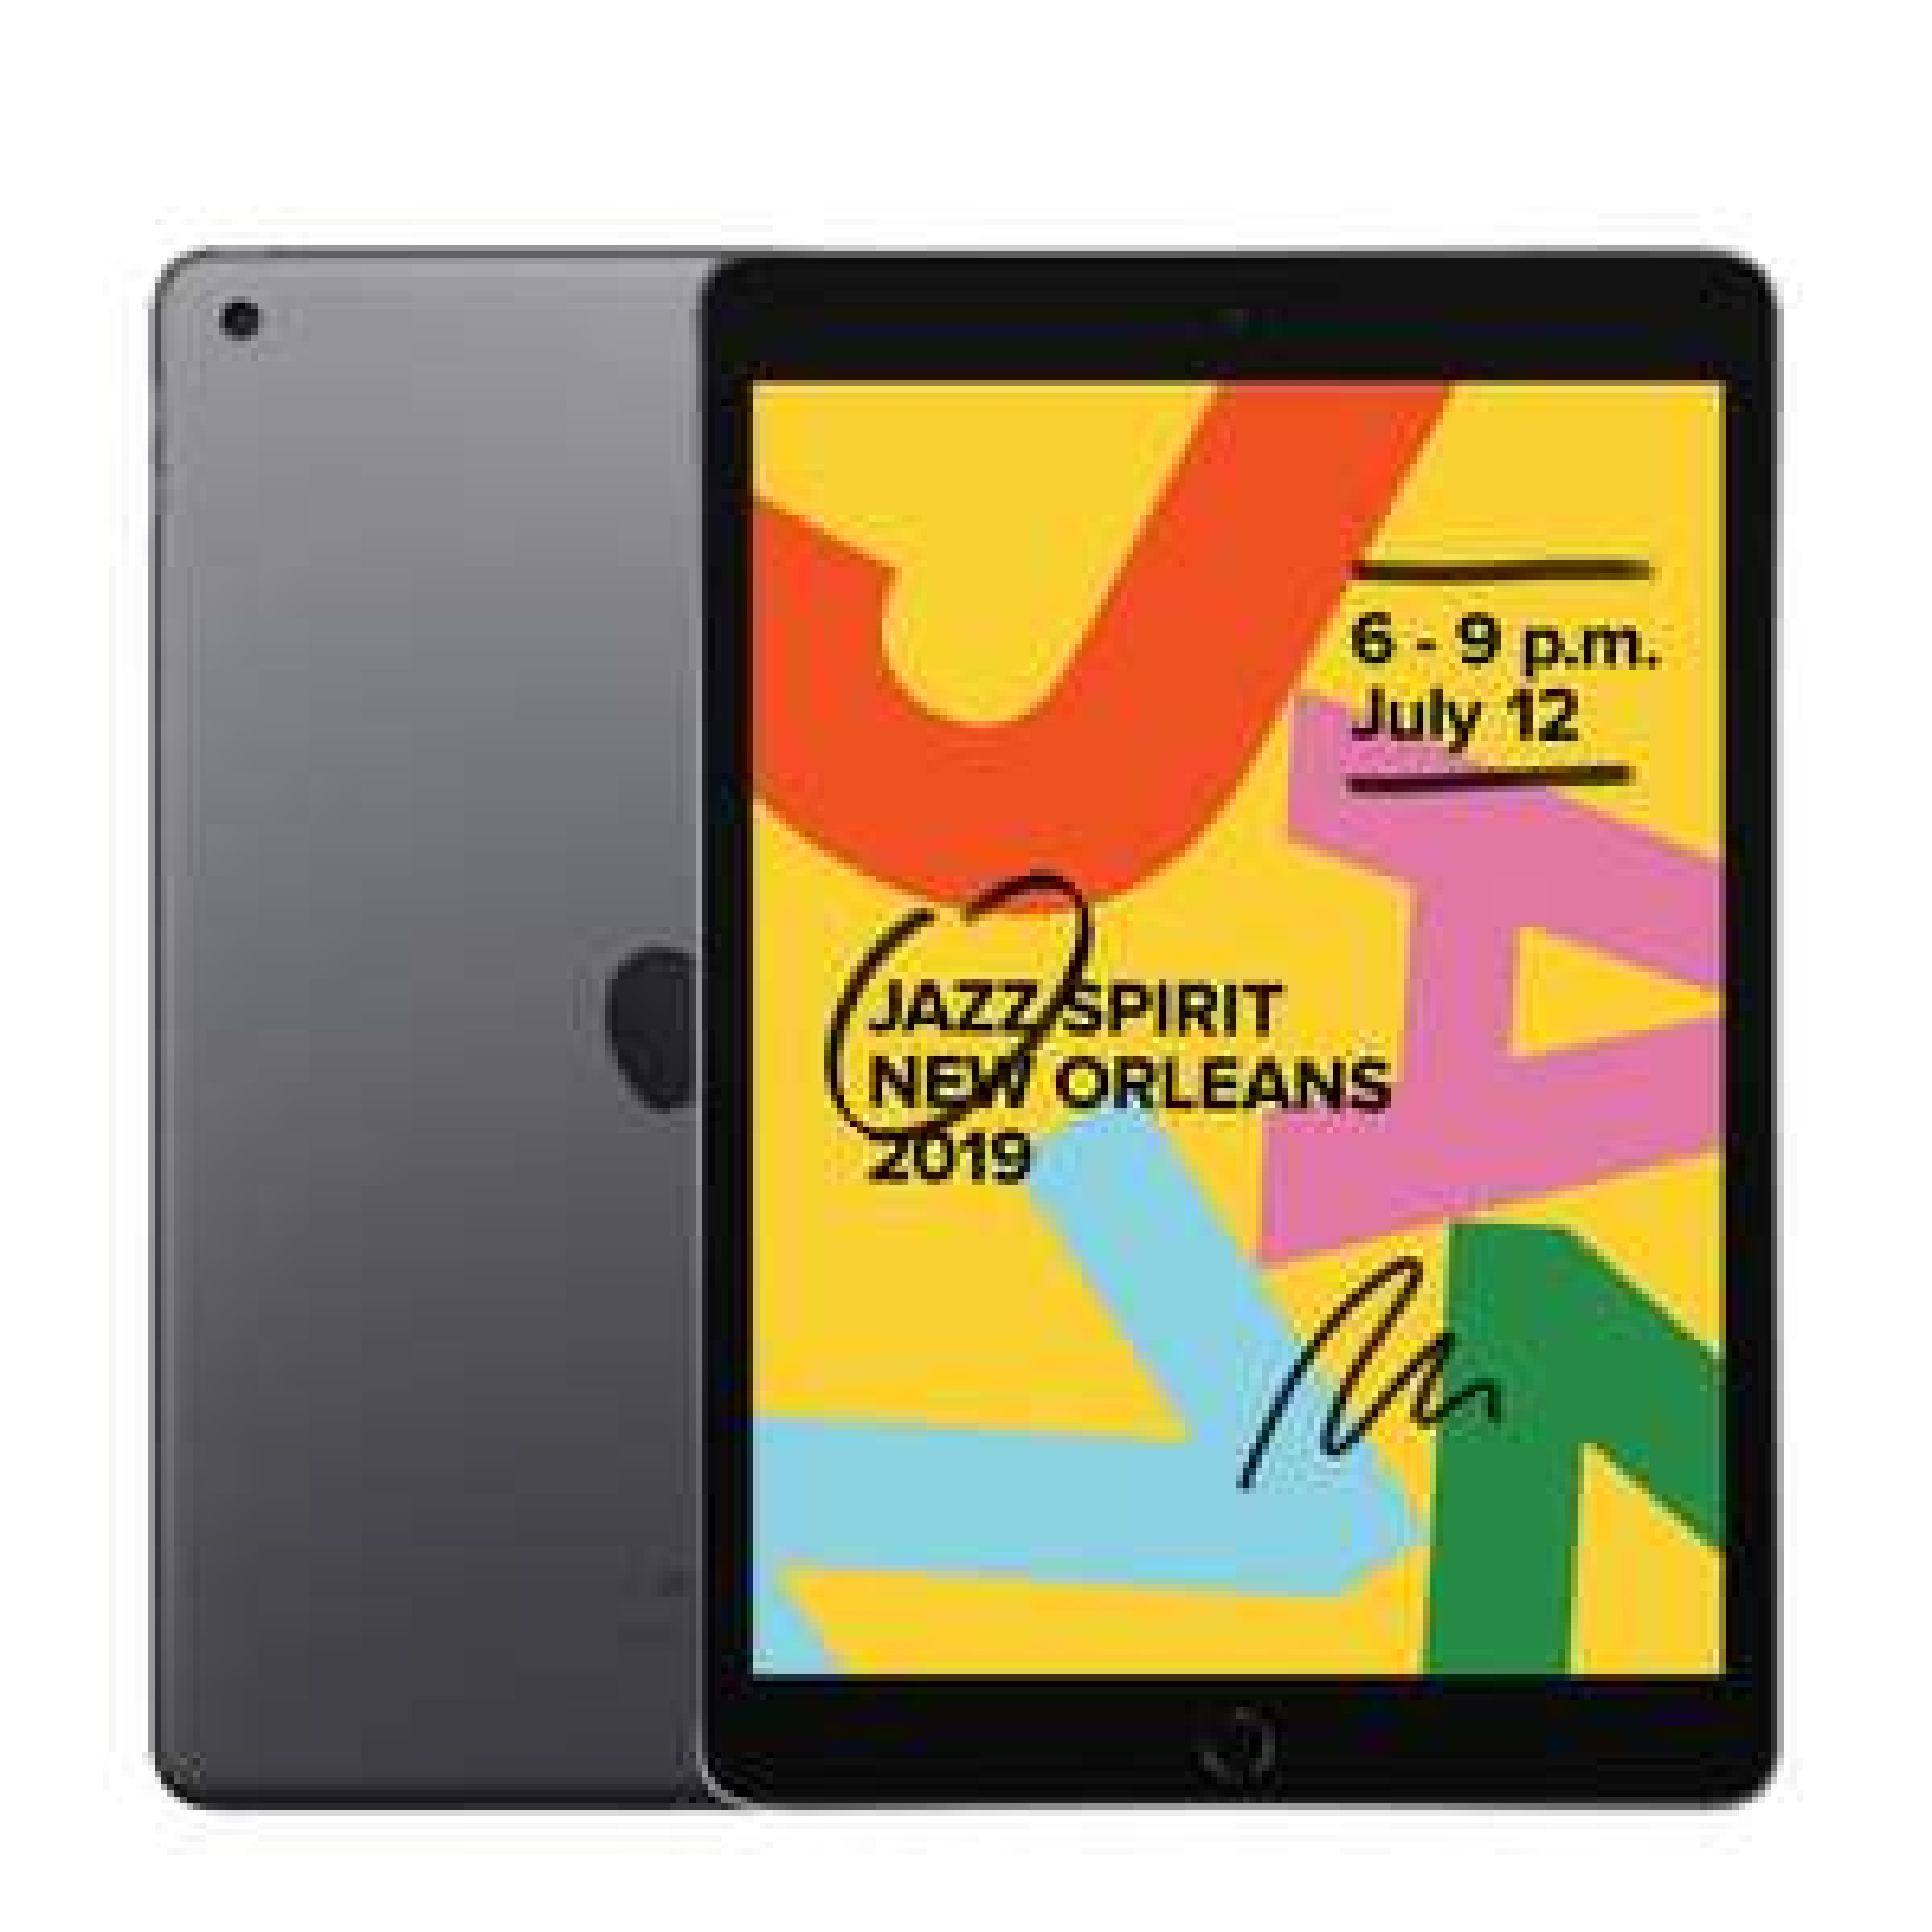 Apple iPad 2019 - 128GB Wifi (Space Gray) US model + NL stekker @ Wehkamp